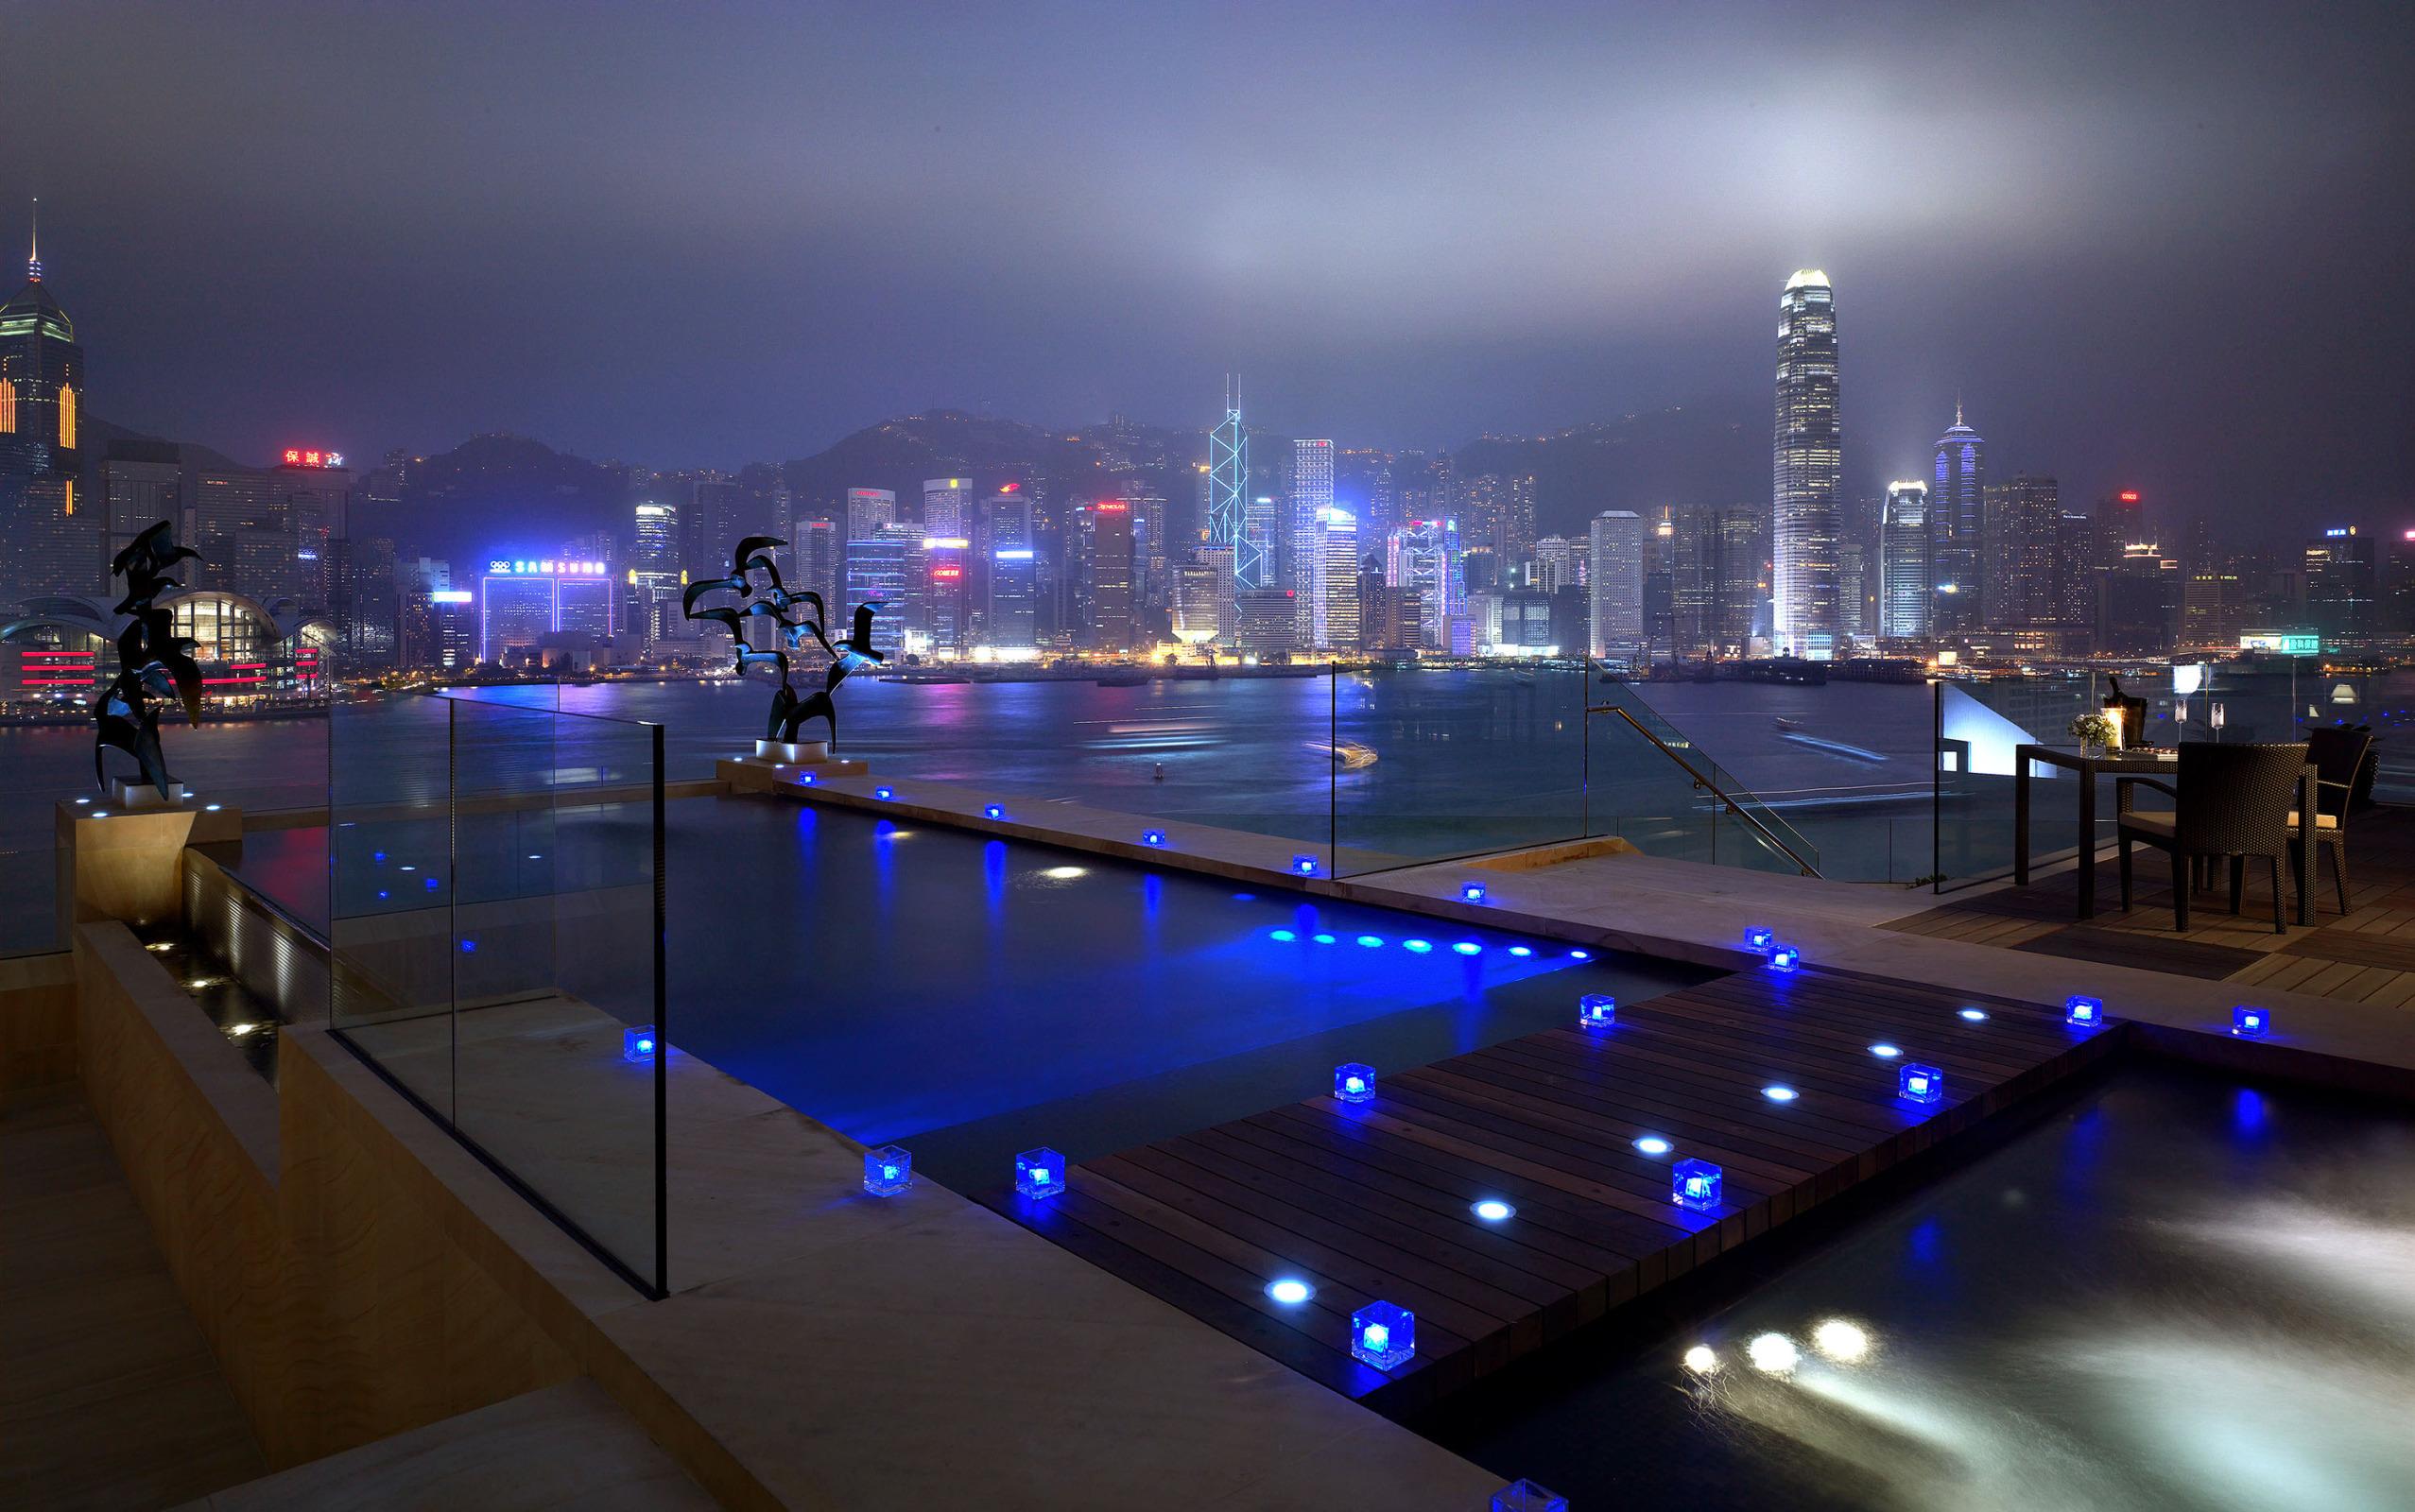 бассейн ночь pool night без смс